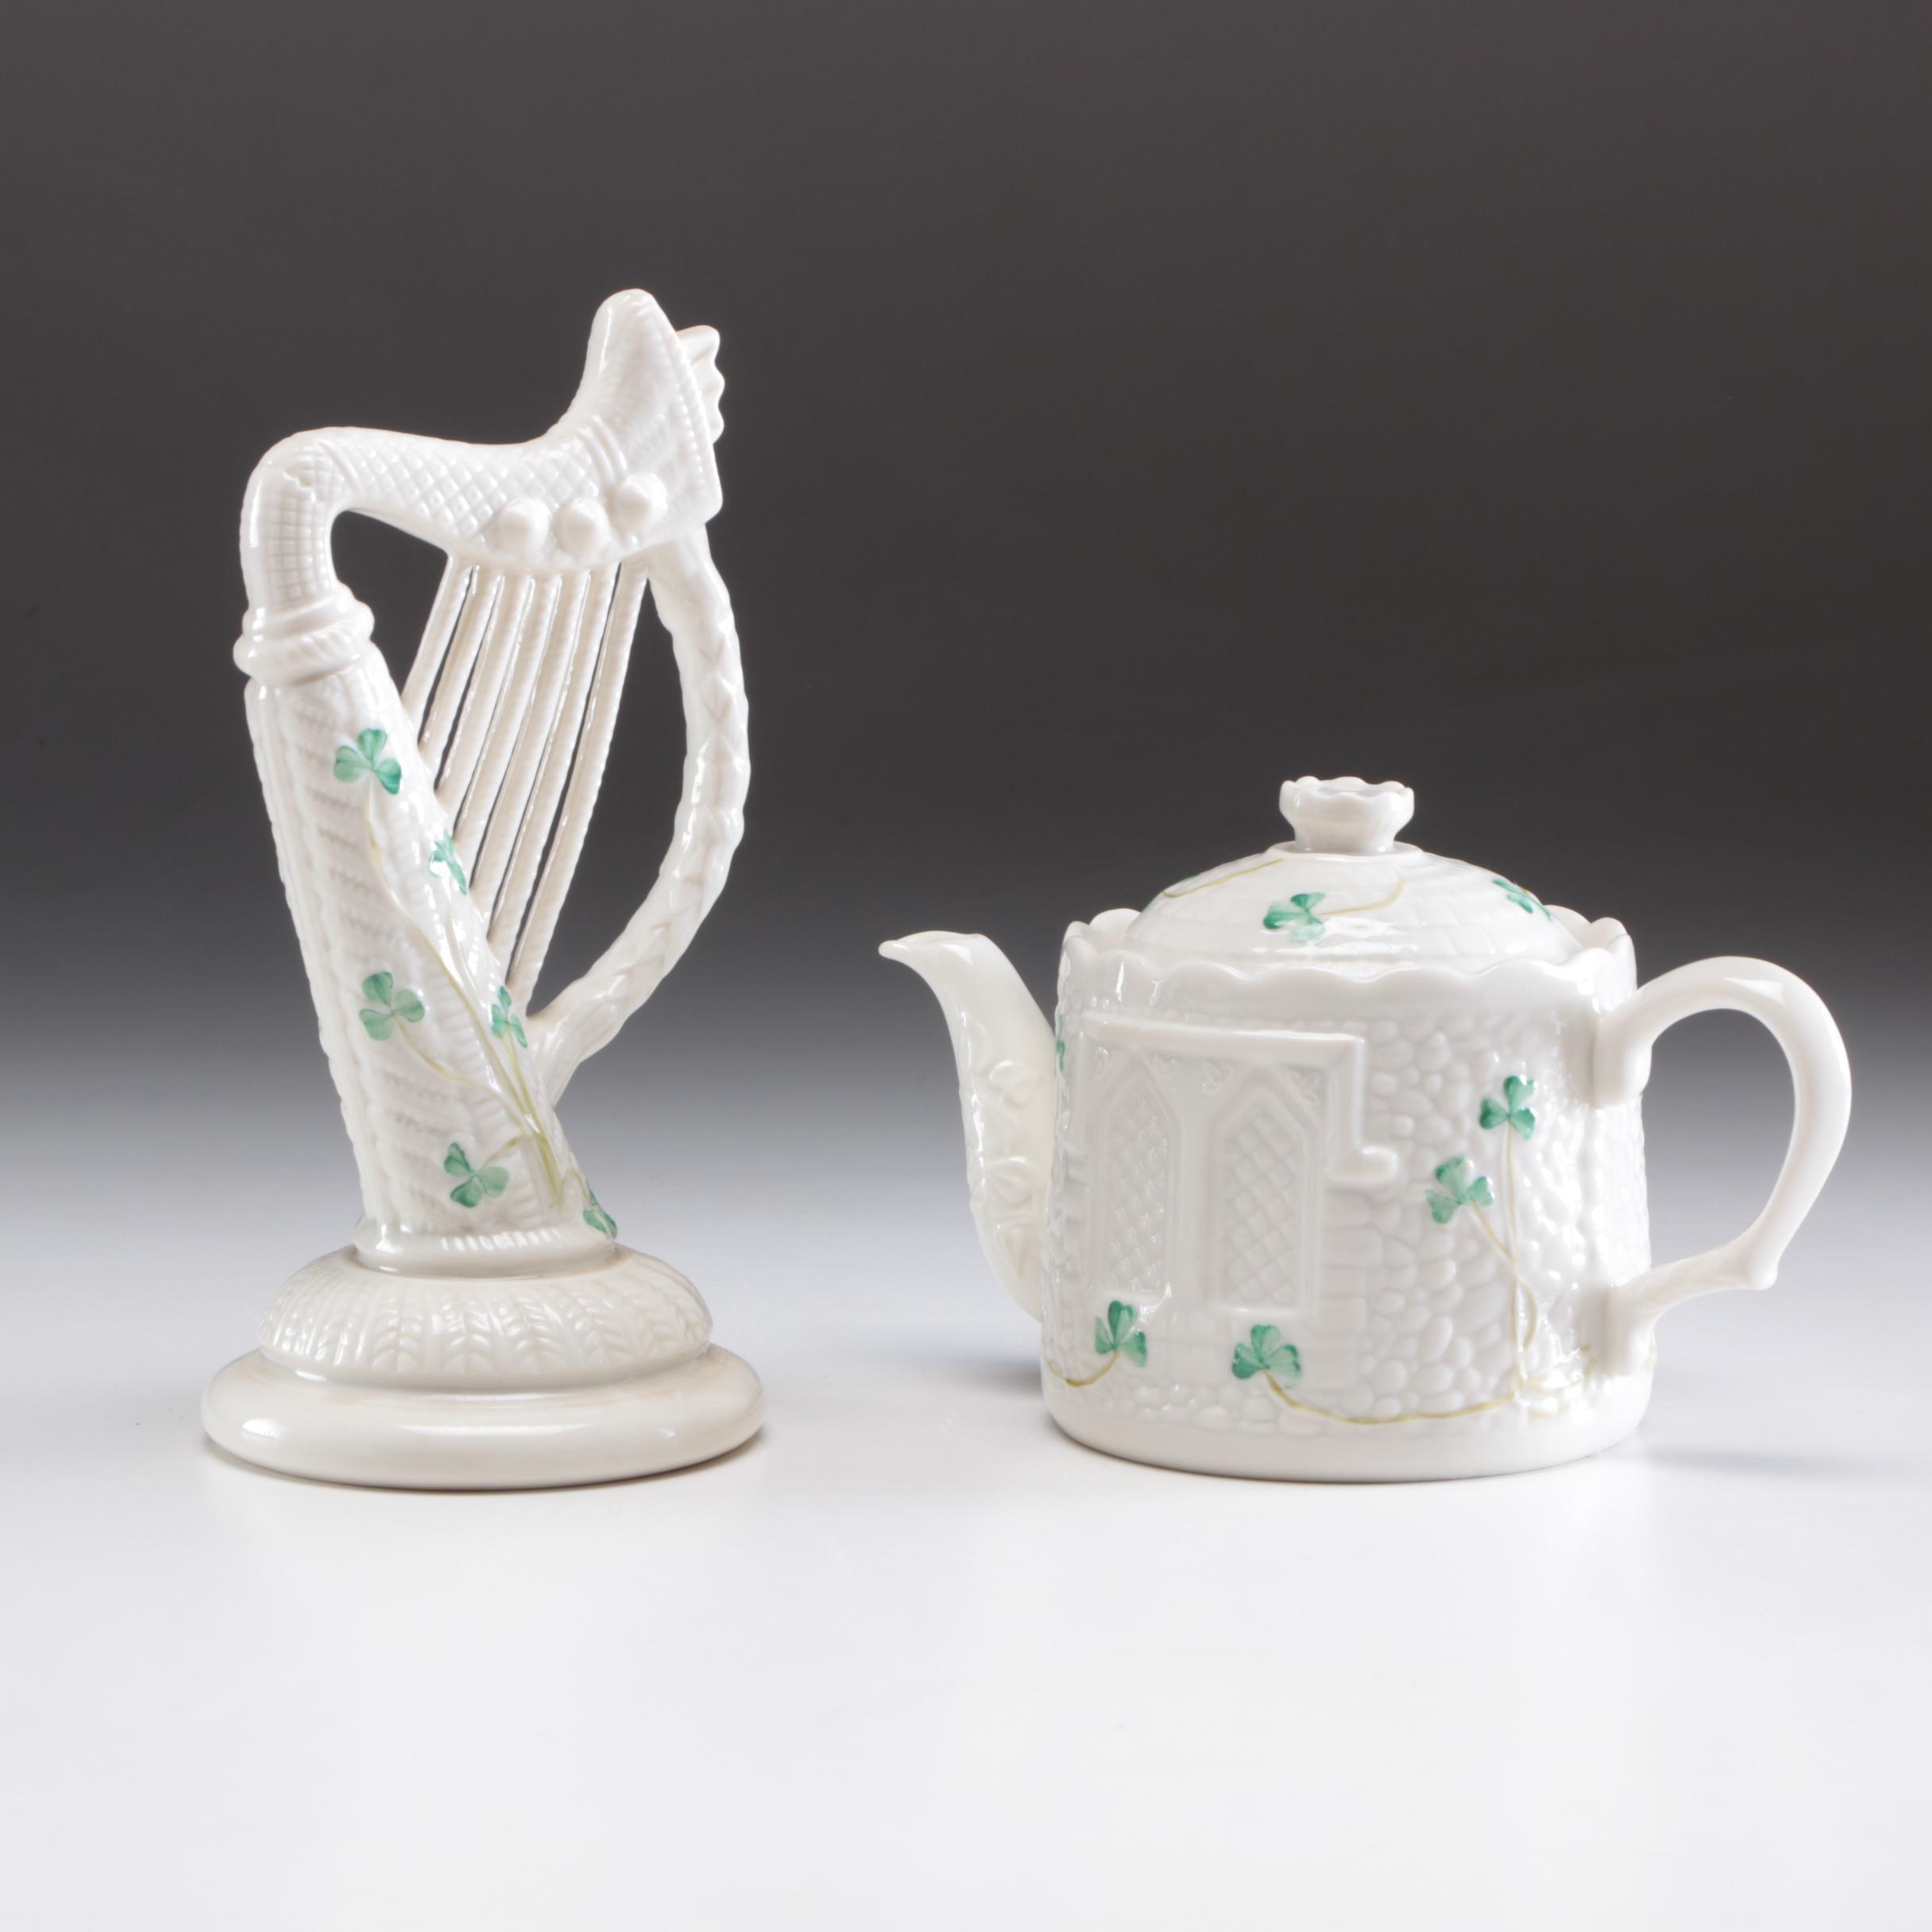 "Belleek Porcelain ""Shamrock"" Teapot and Harp Figurine, Mid to Late 20th Century"